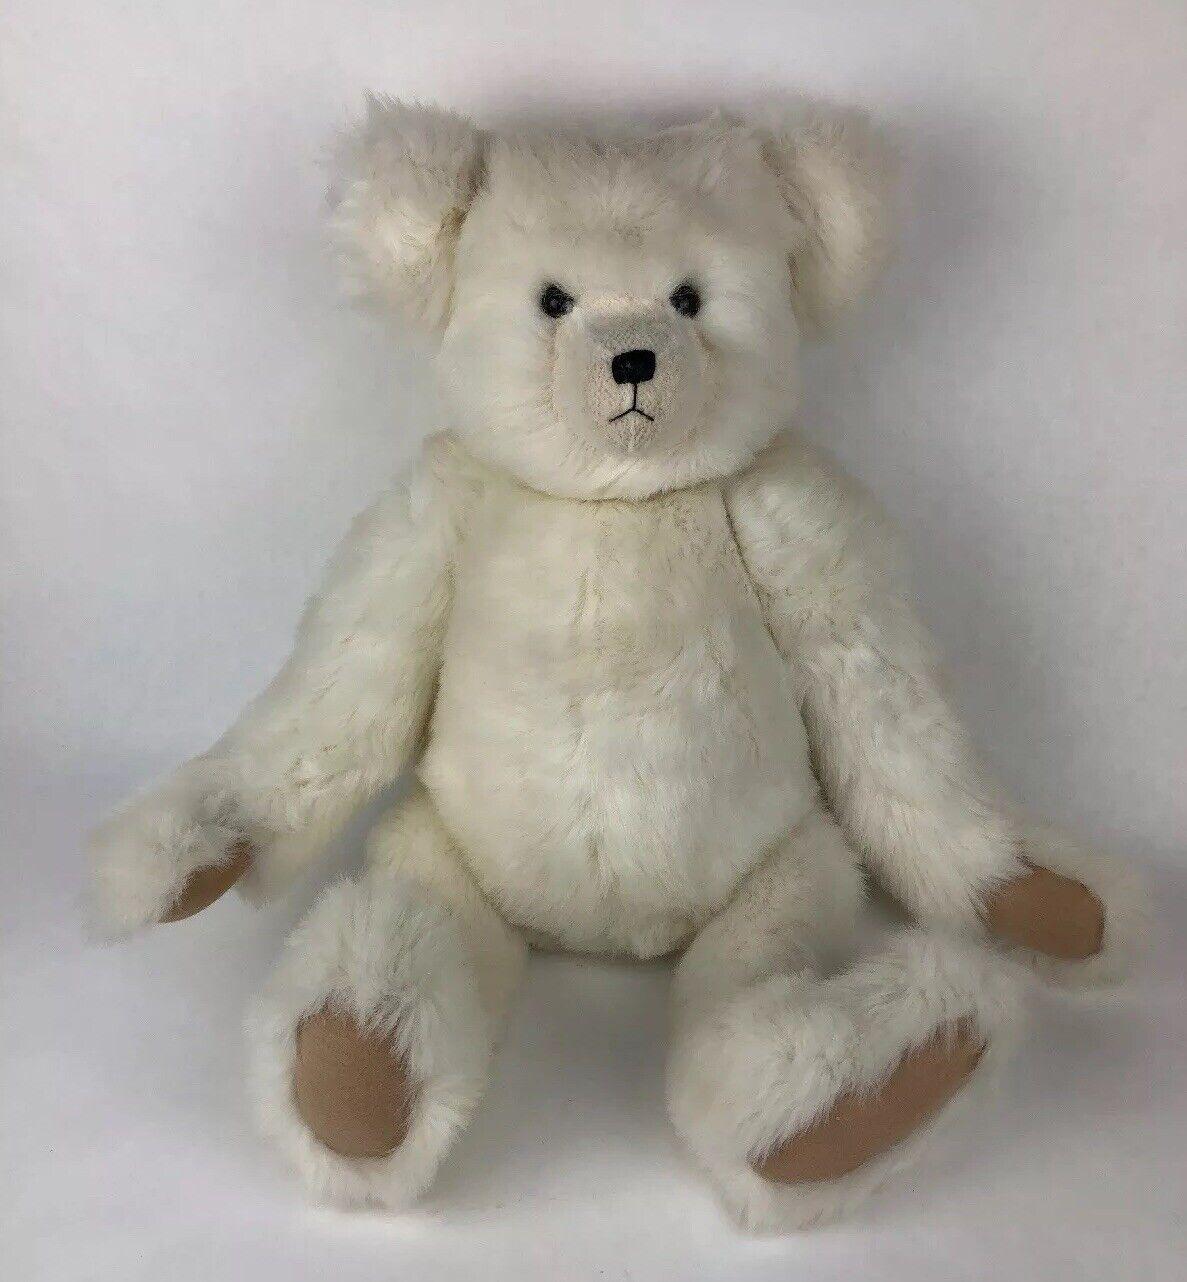 STEIFF TEDDY BEAR  REPLICA BLONDe MOHAIR 25.5  BEAR REPLICA - FSTSHP